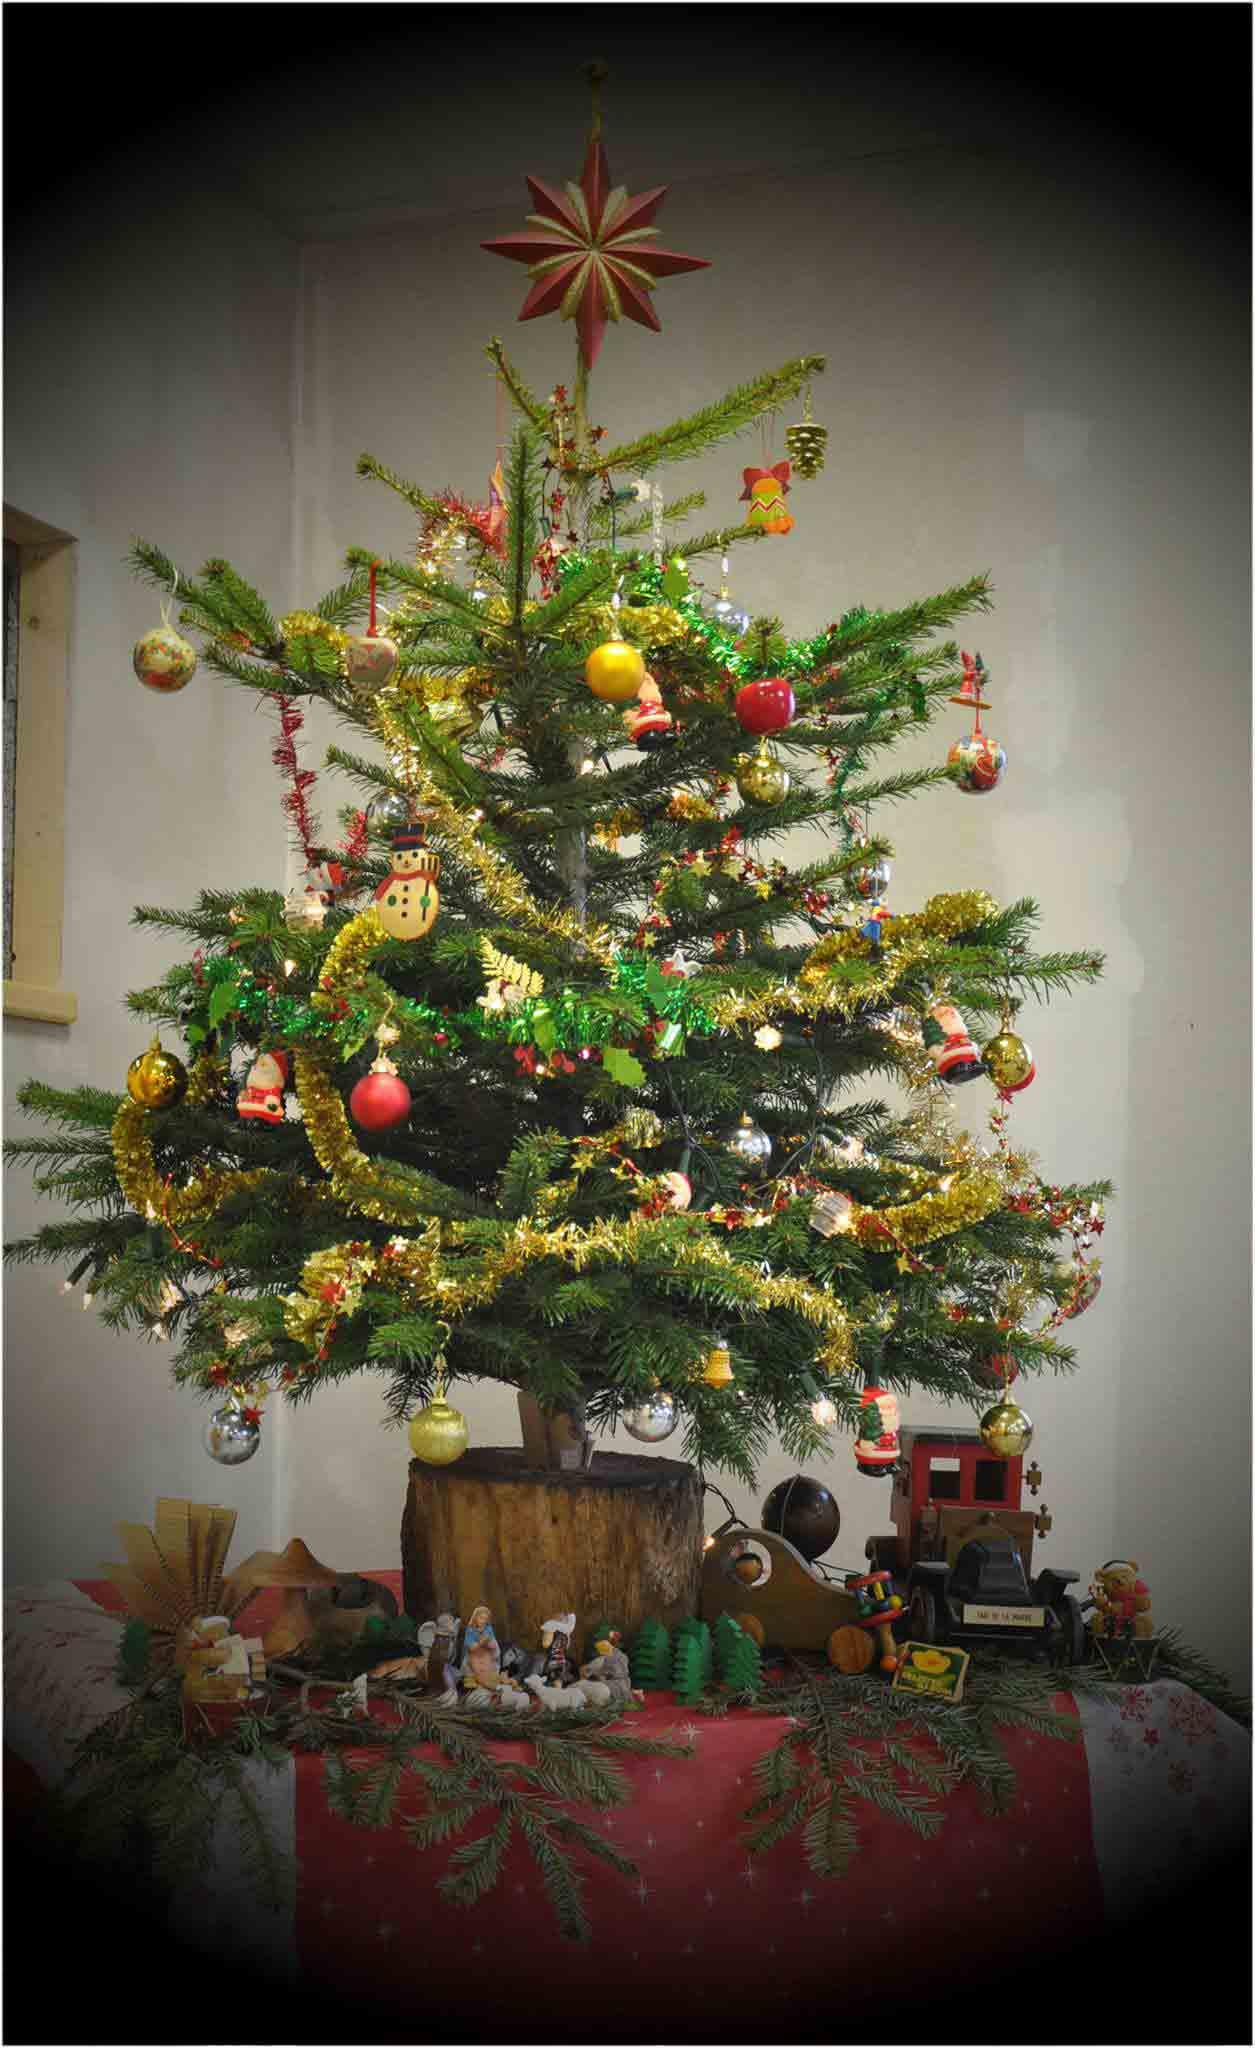 Sapin de Noël d'Eurodouglas en 2013